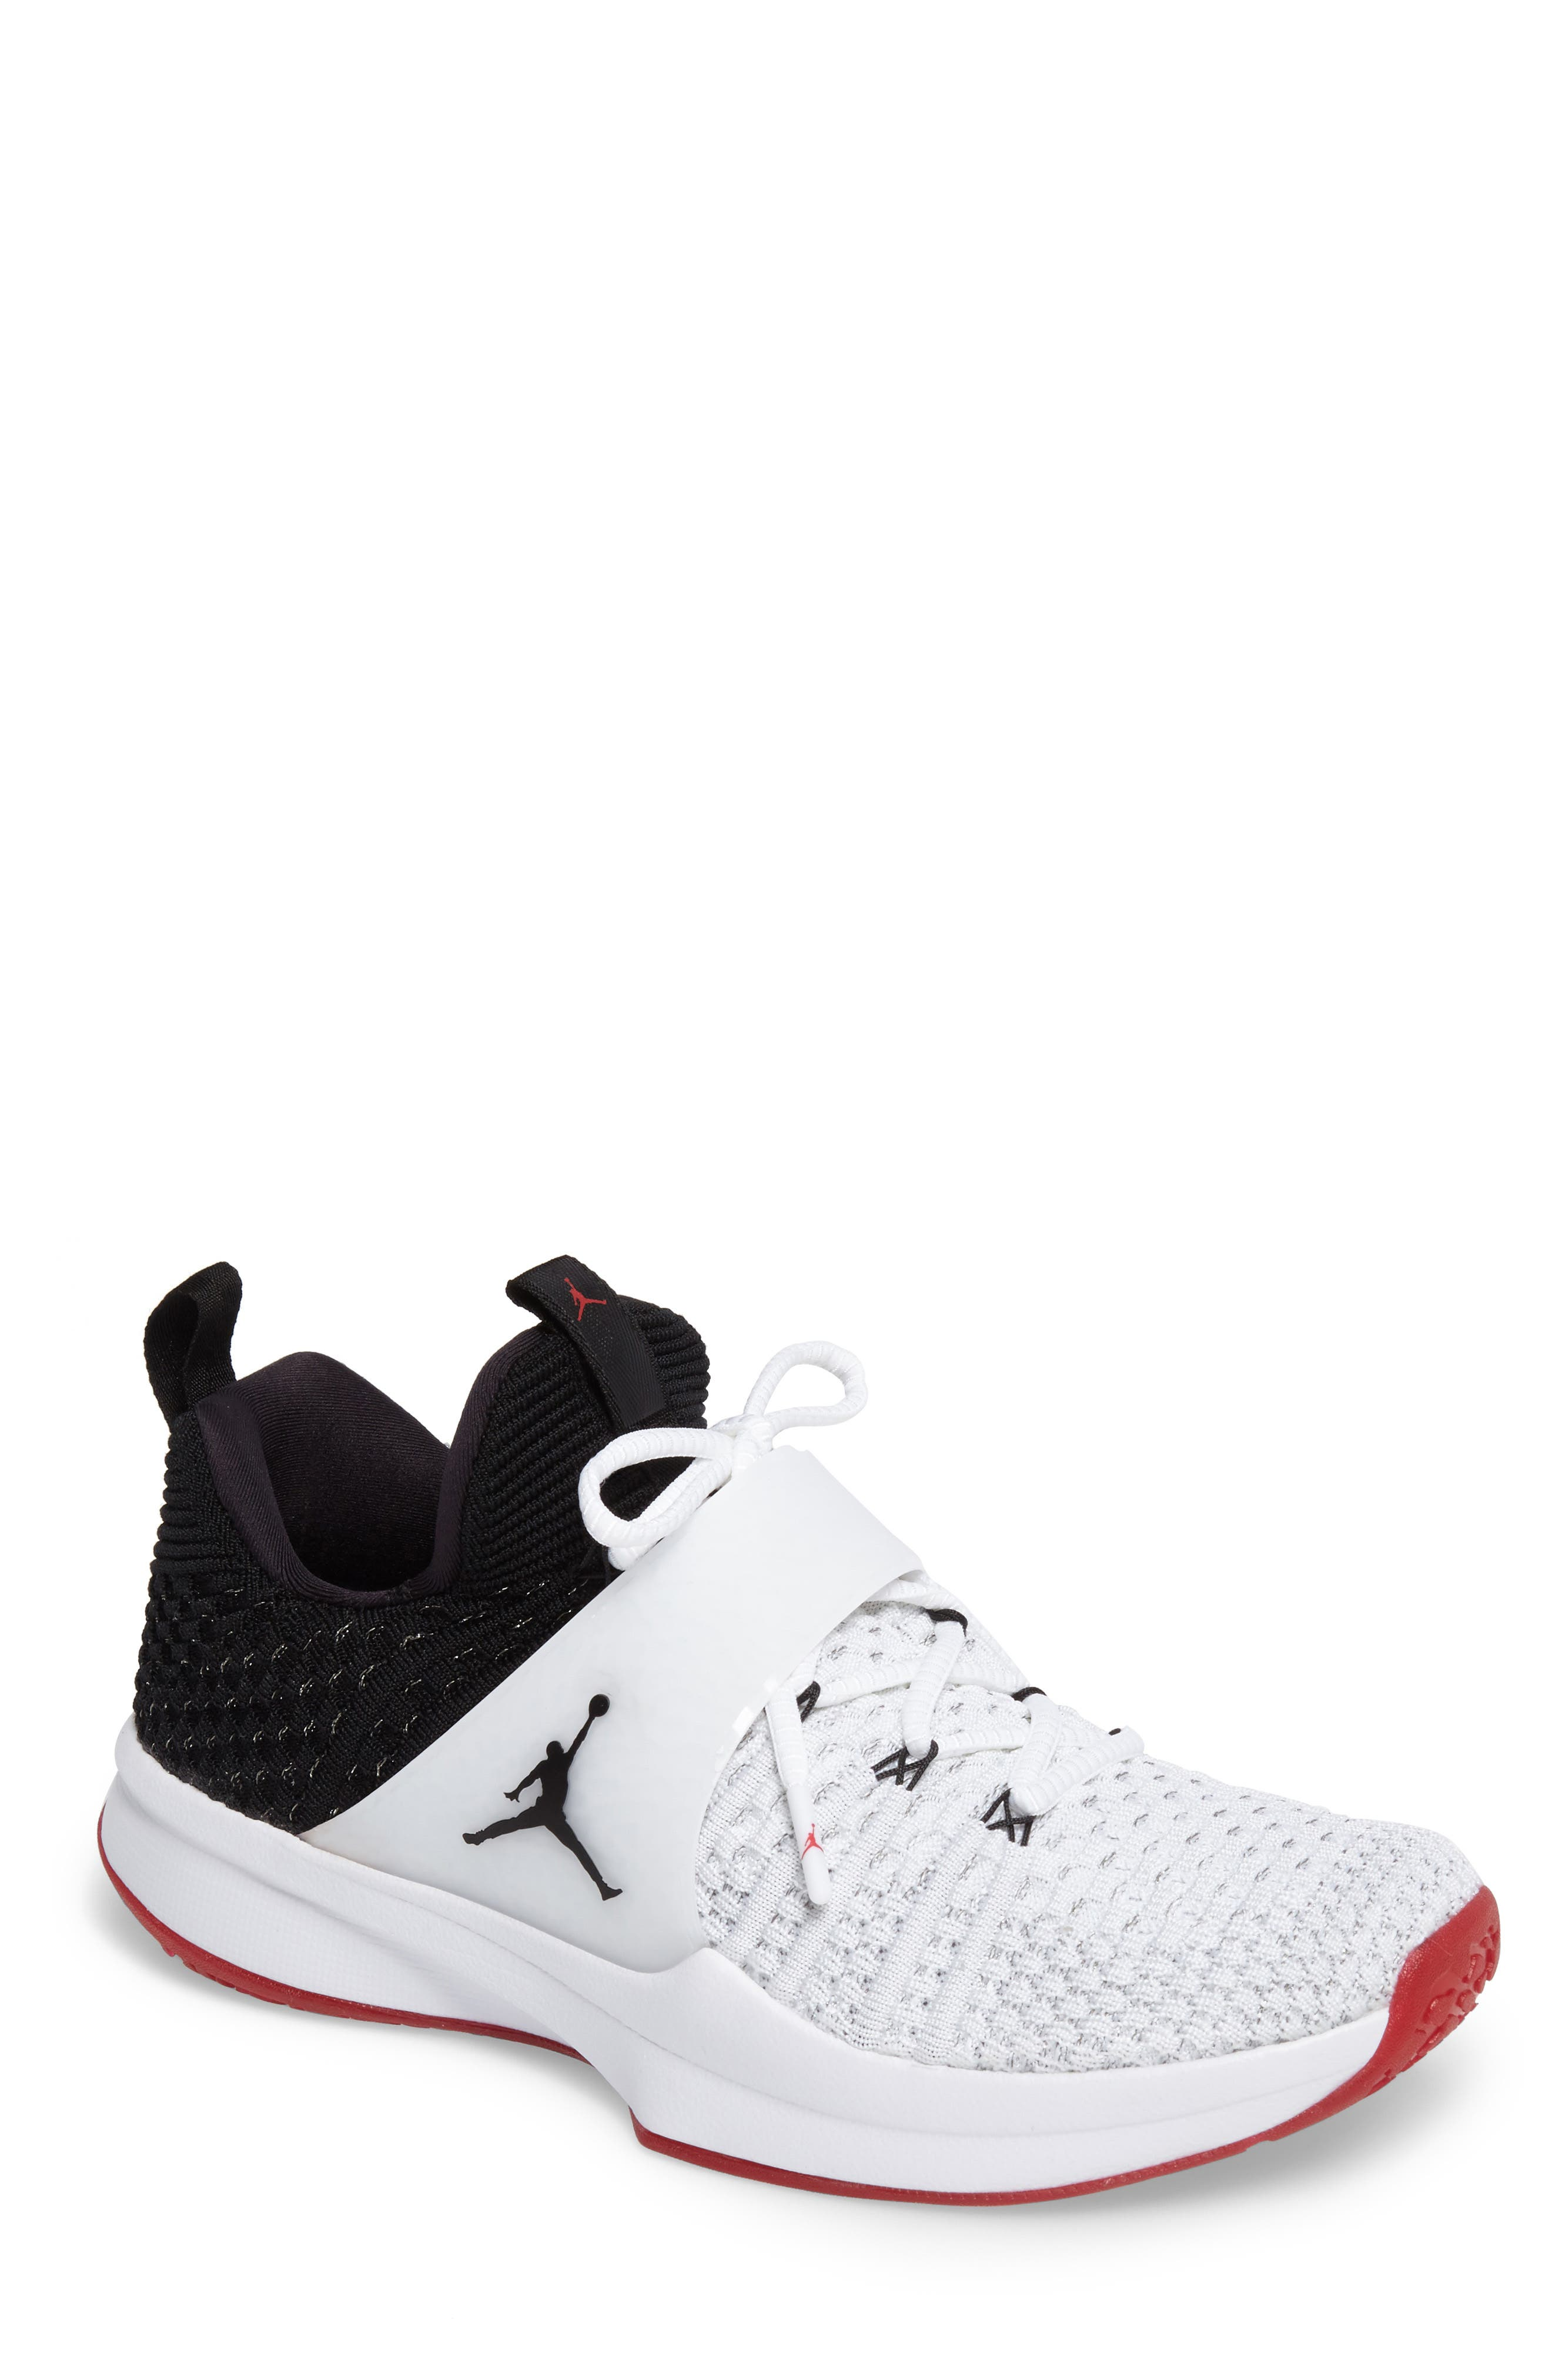 Jordan Flyknit Trainer 2 Low Sneaker,                         Main,                         color, White/ Black/ Black/ Gym Red